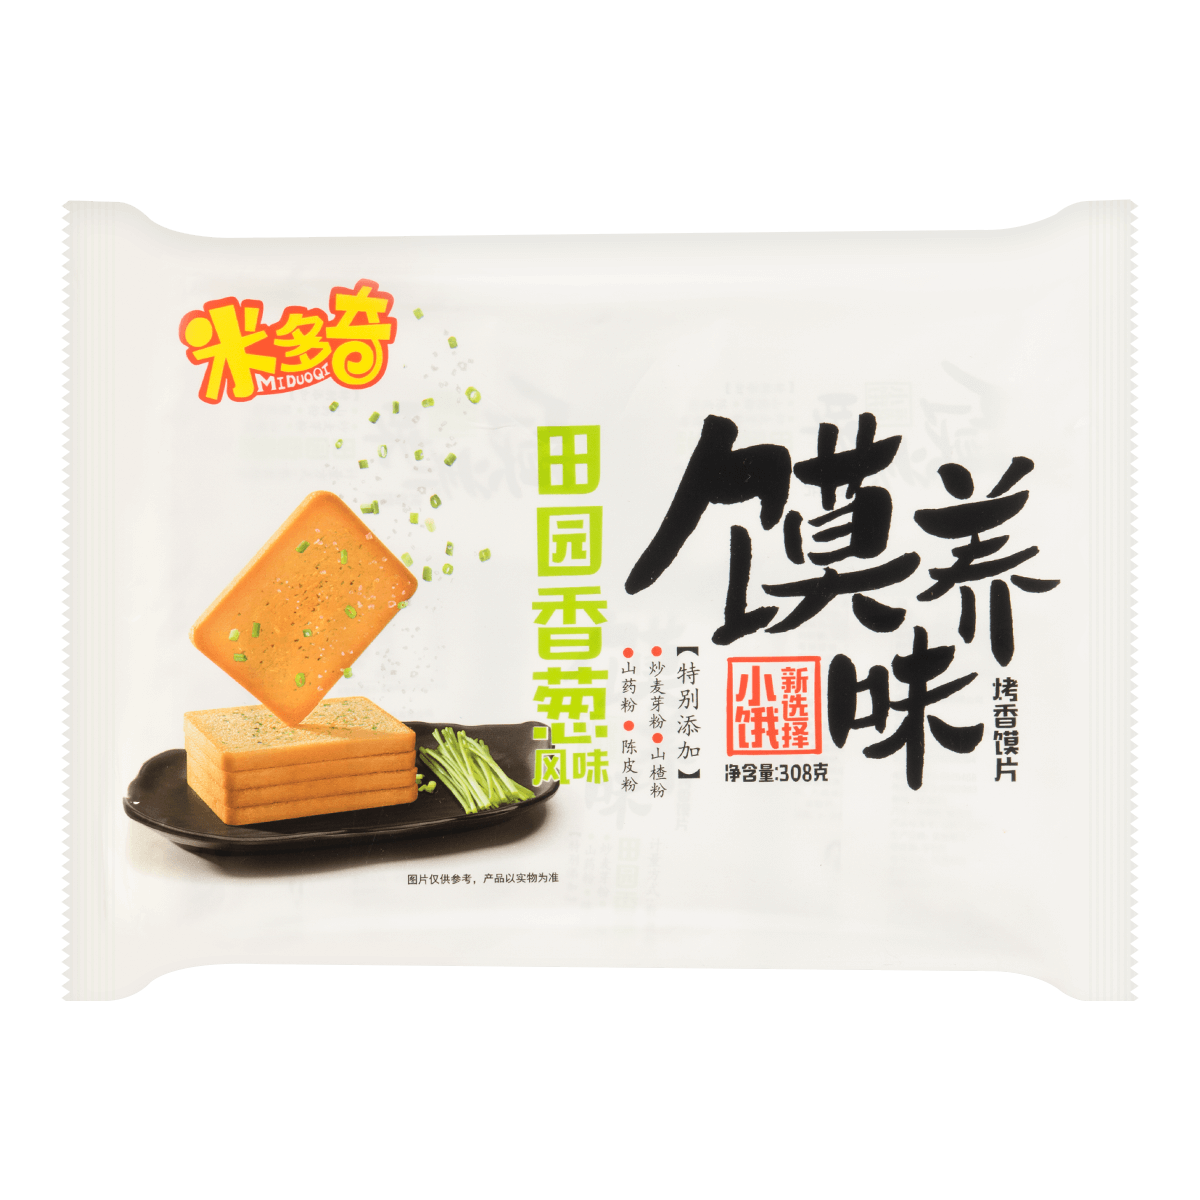 MDQ-Toasted Bread Slice (Green Onion Flavor) 308g